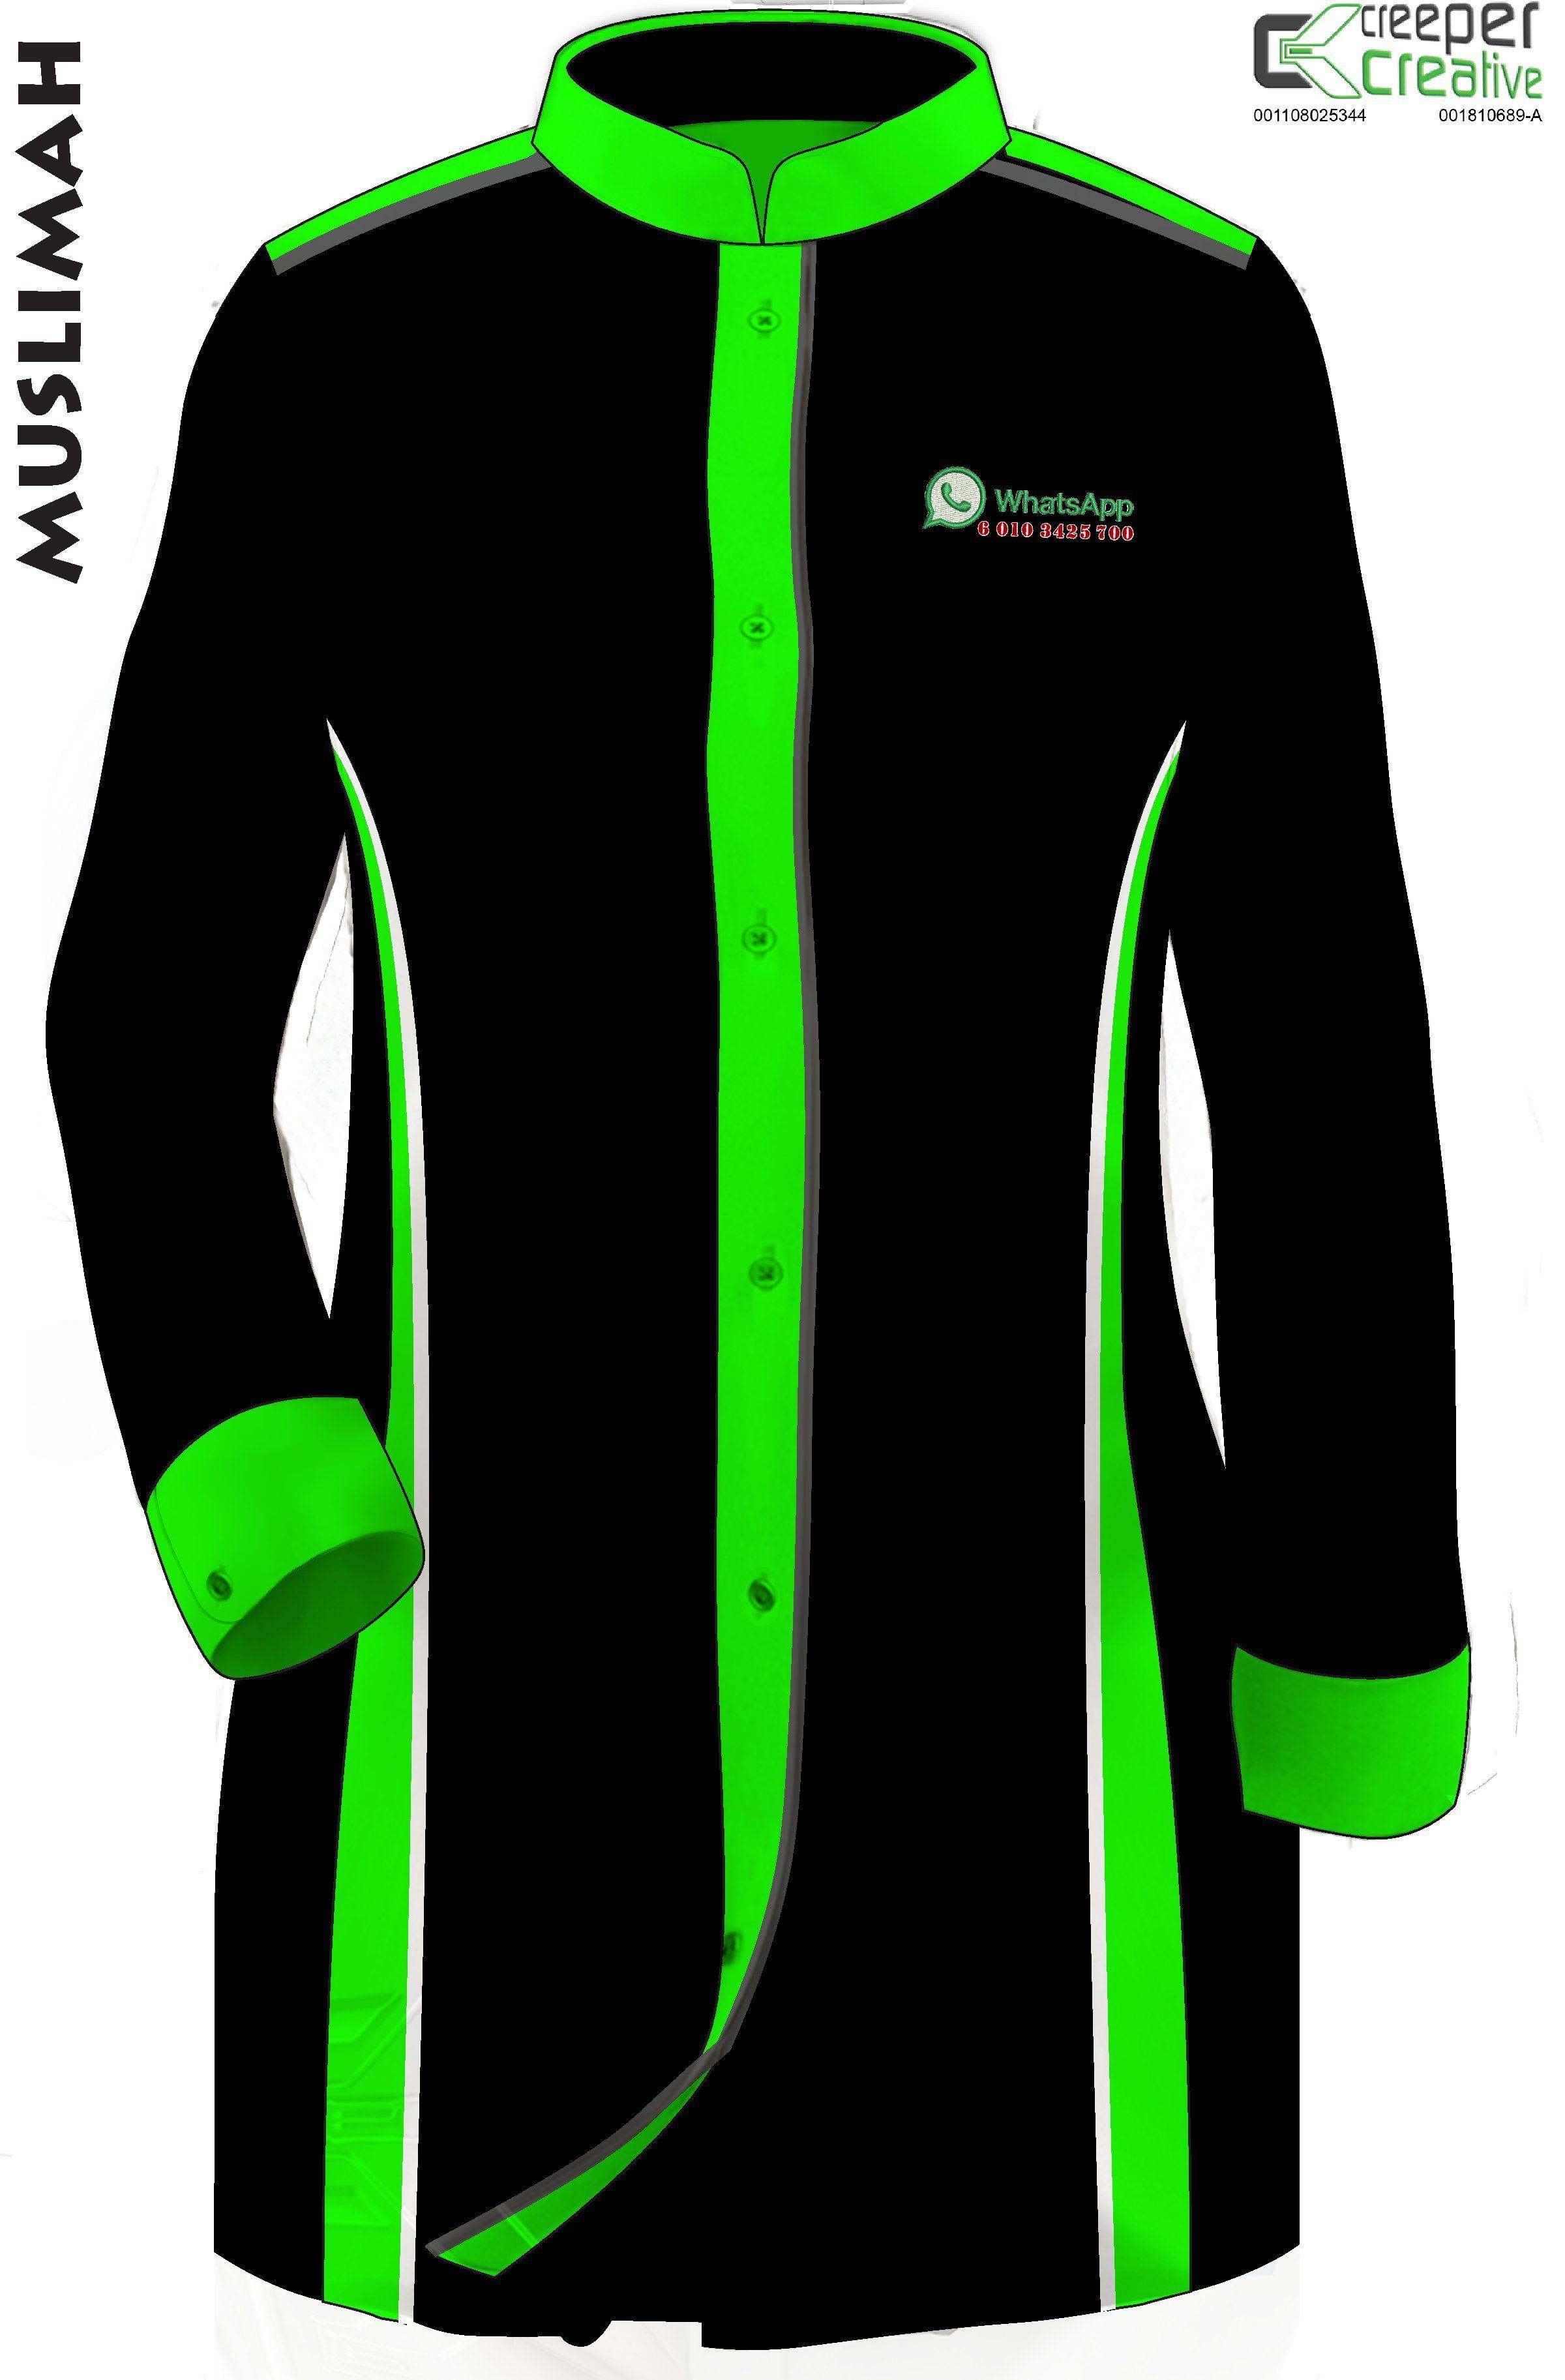 Design Baju Korporat Terbaru Shirts, Corporate uniforms